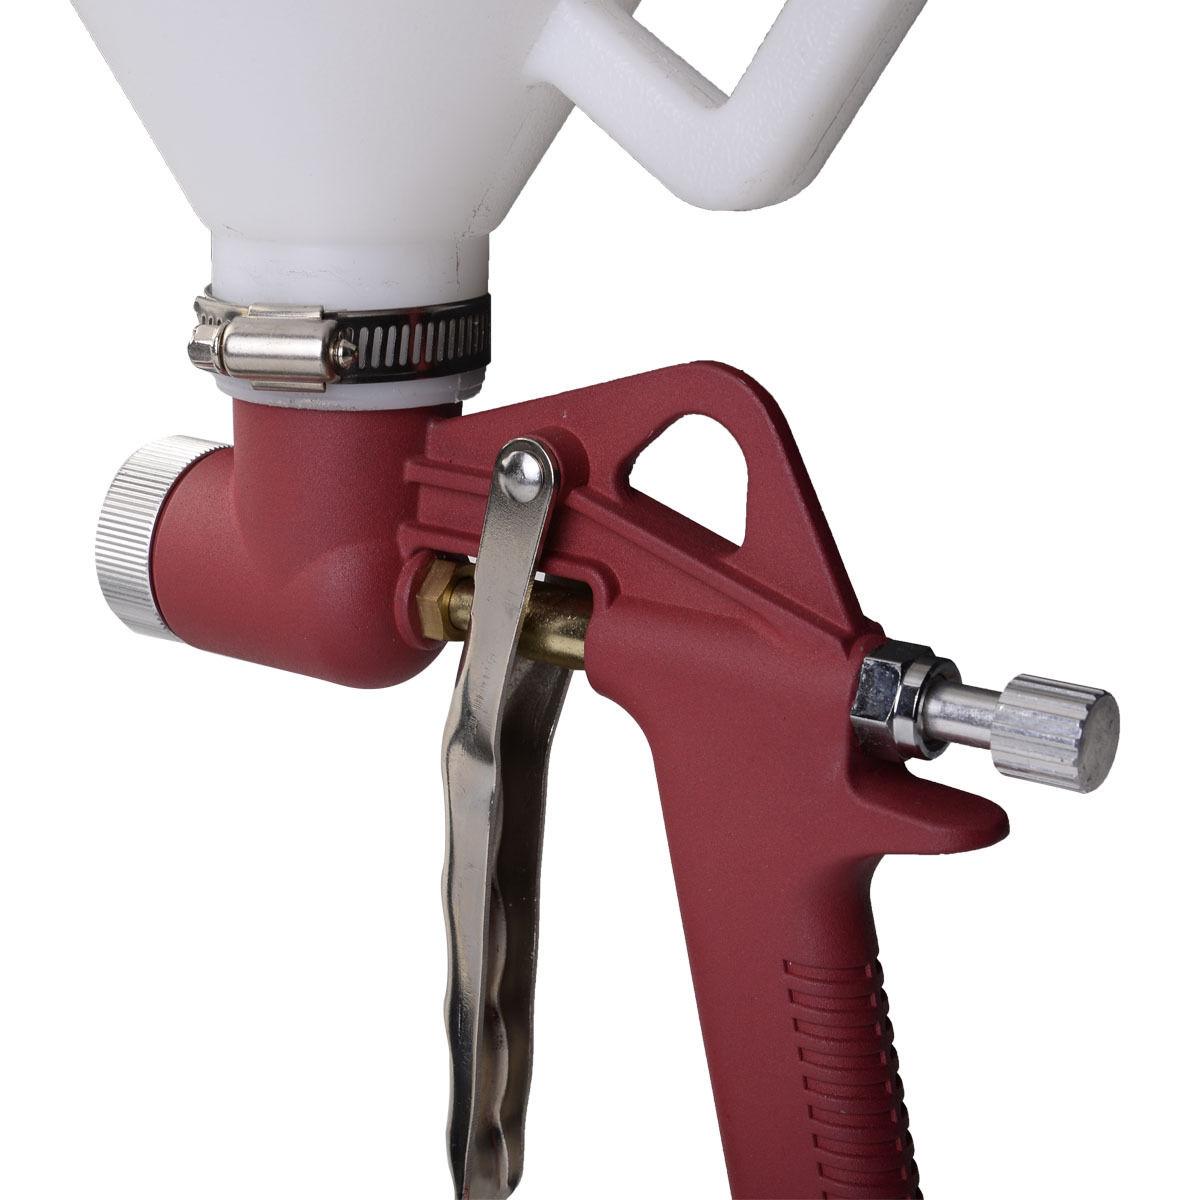 Air Hopper Spray Gun Texture Tool with 3 Nozzle